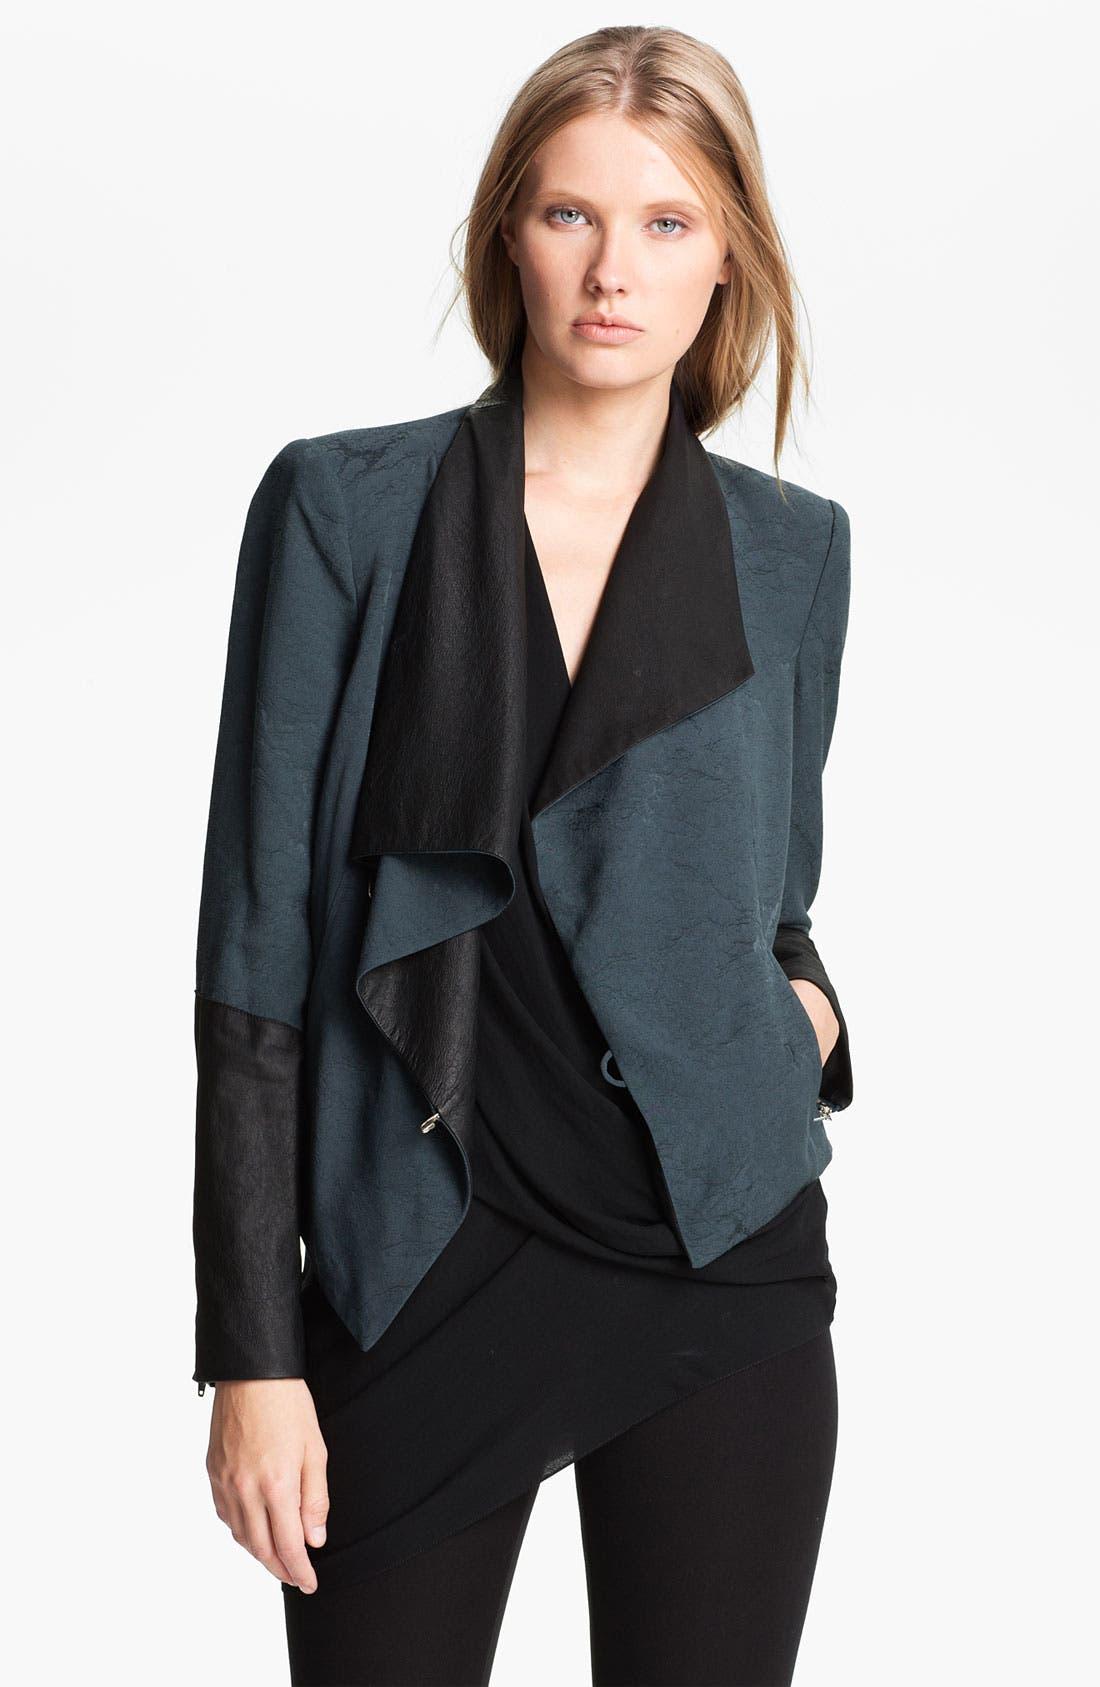 Alternate Image 1 Selected - Helmut Lang 'Perma' Jacquard & Leather Jacket